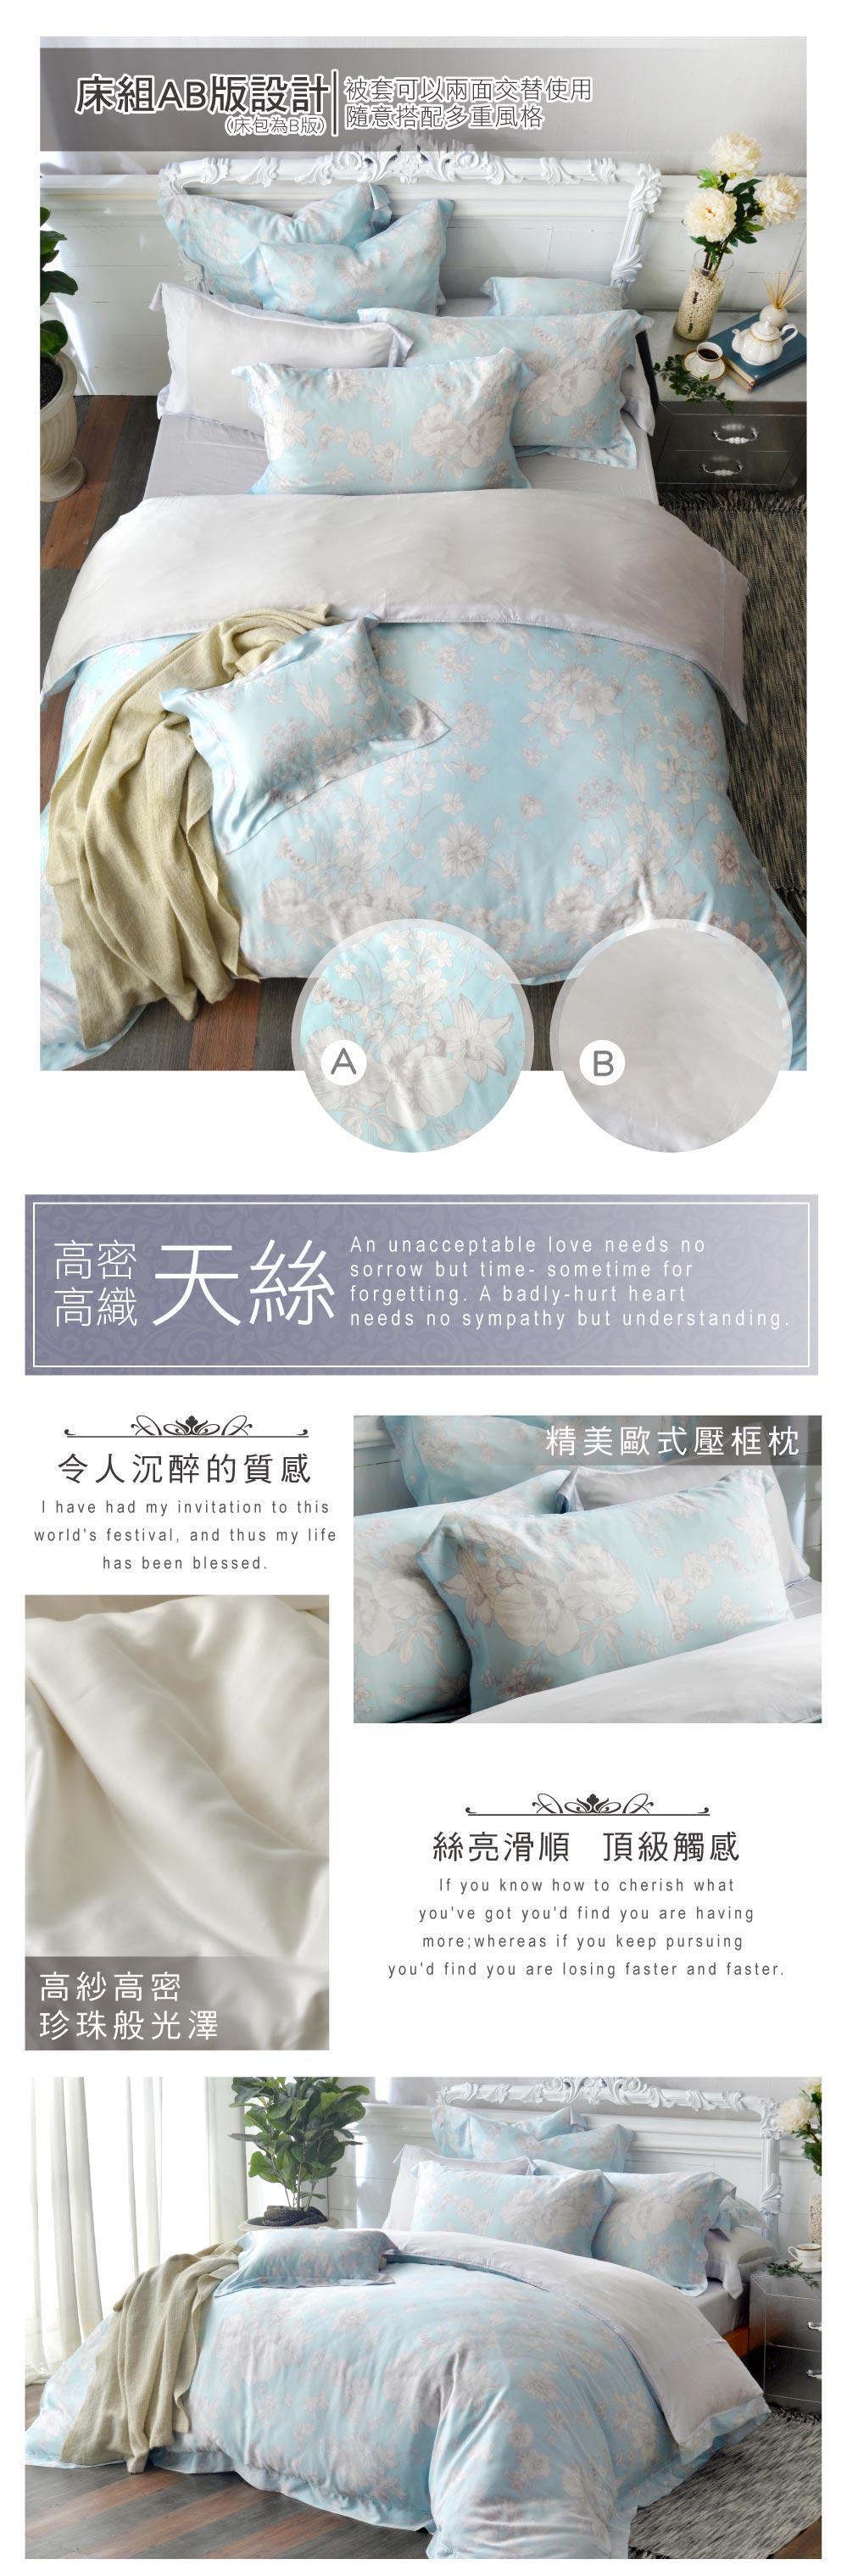 床包,天絲,Labelle